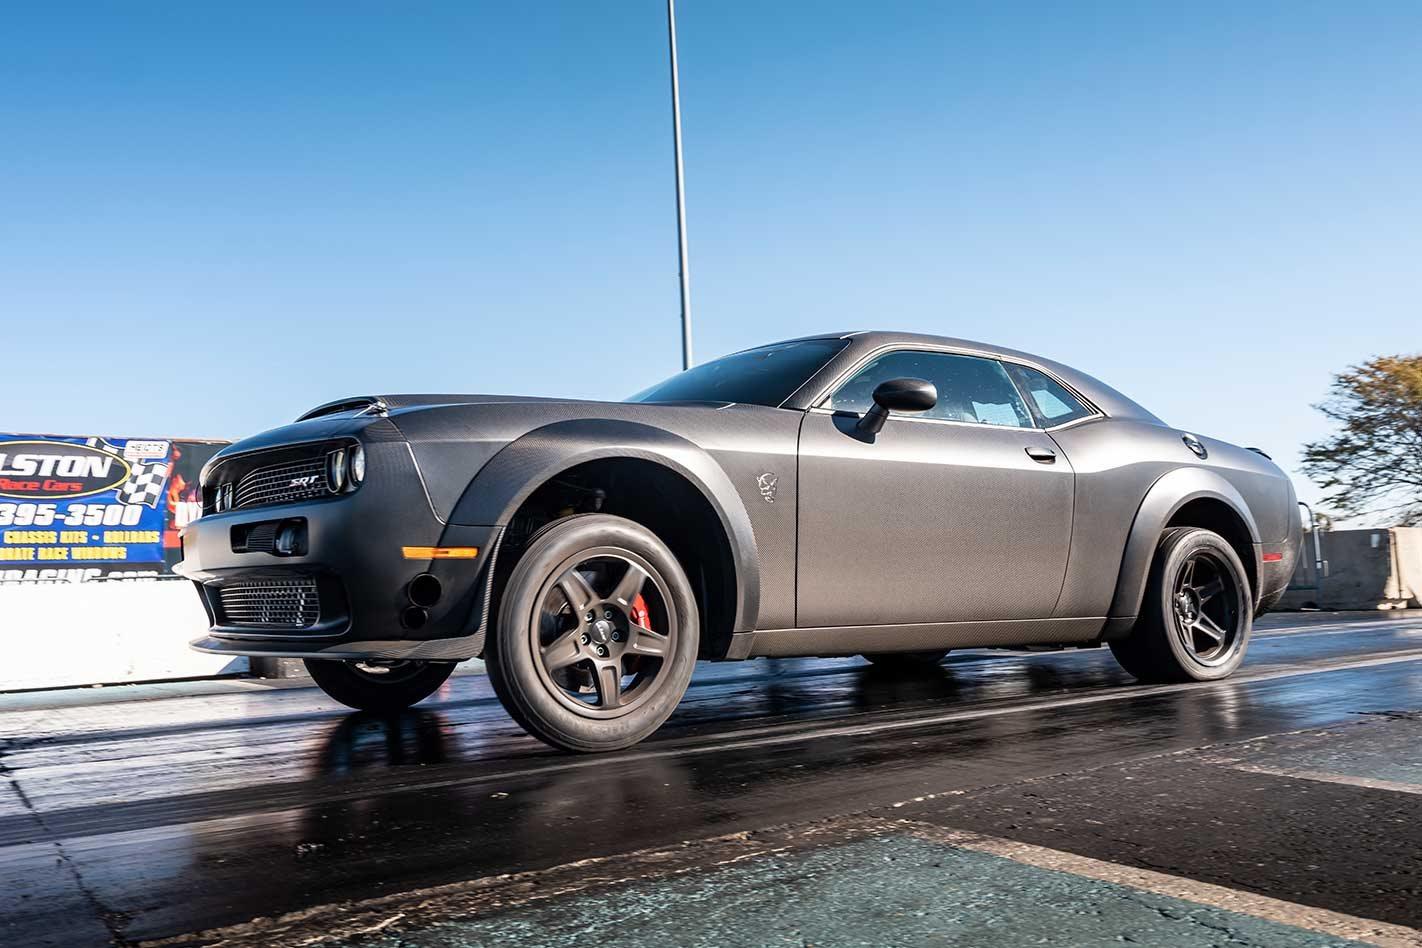 Twin Turbo Carbon Fibre Dodge Challenger Demon Is Fastest